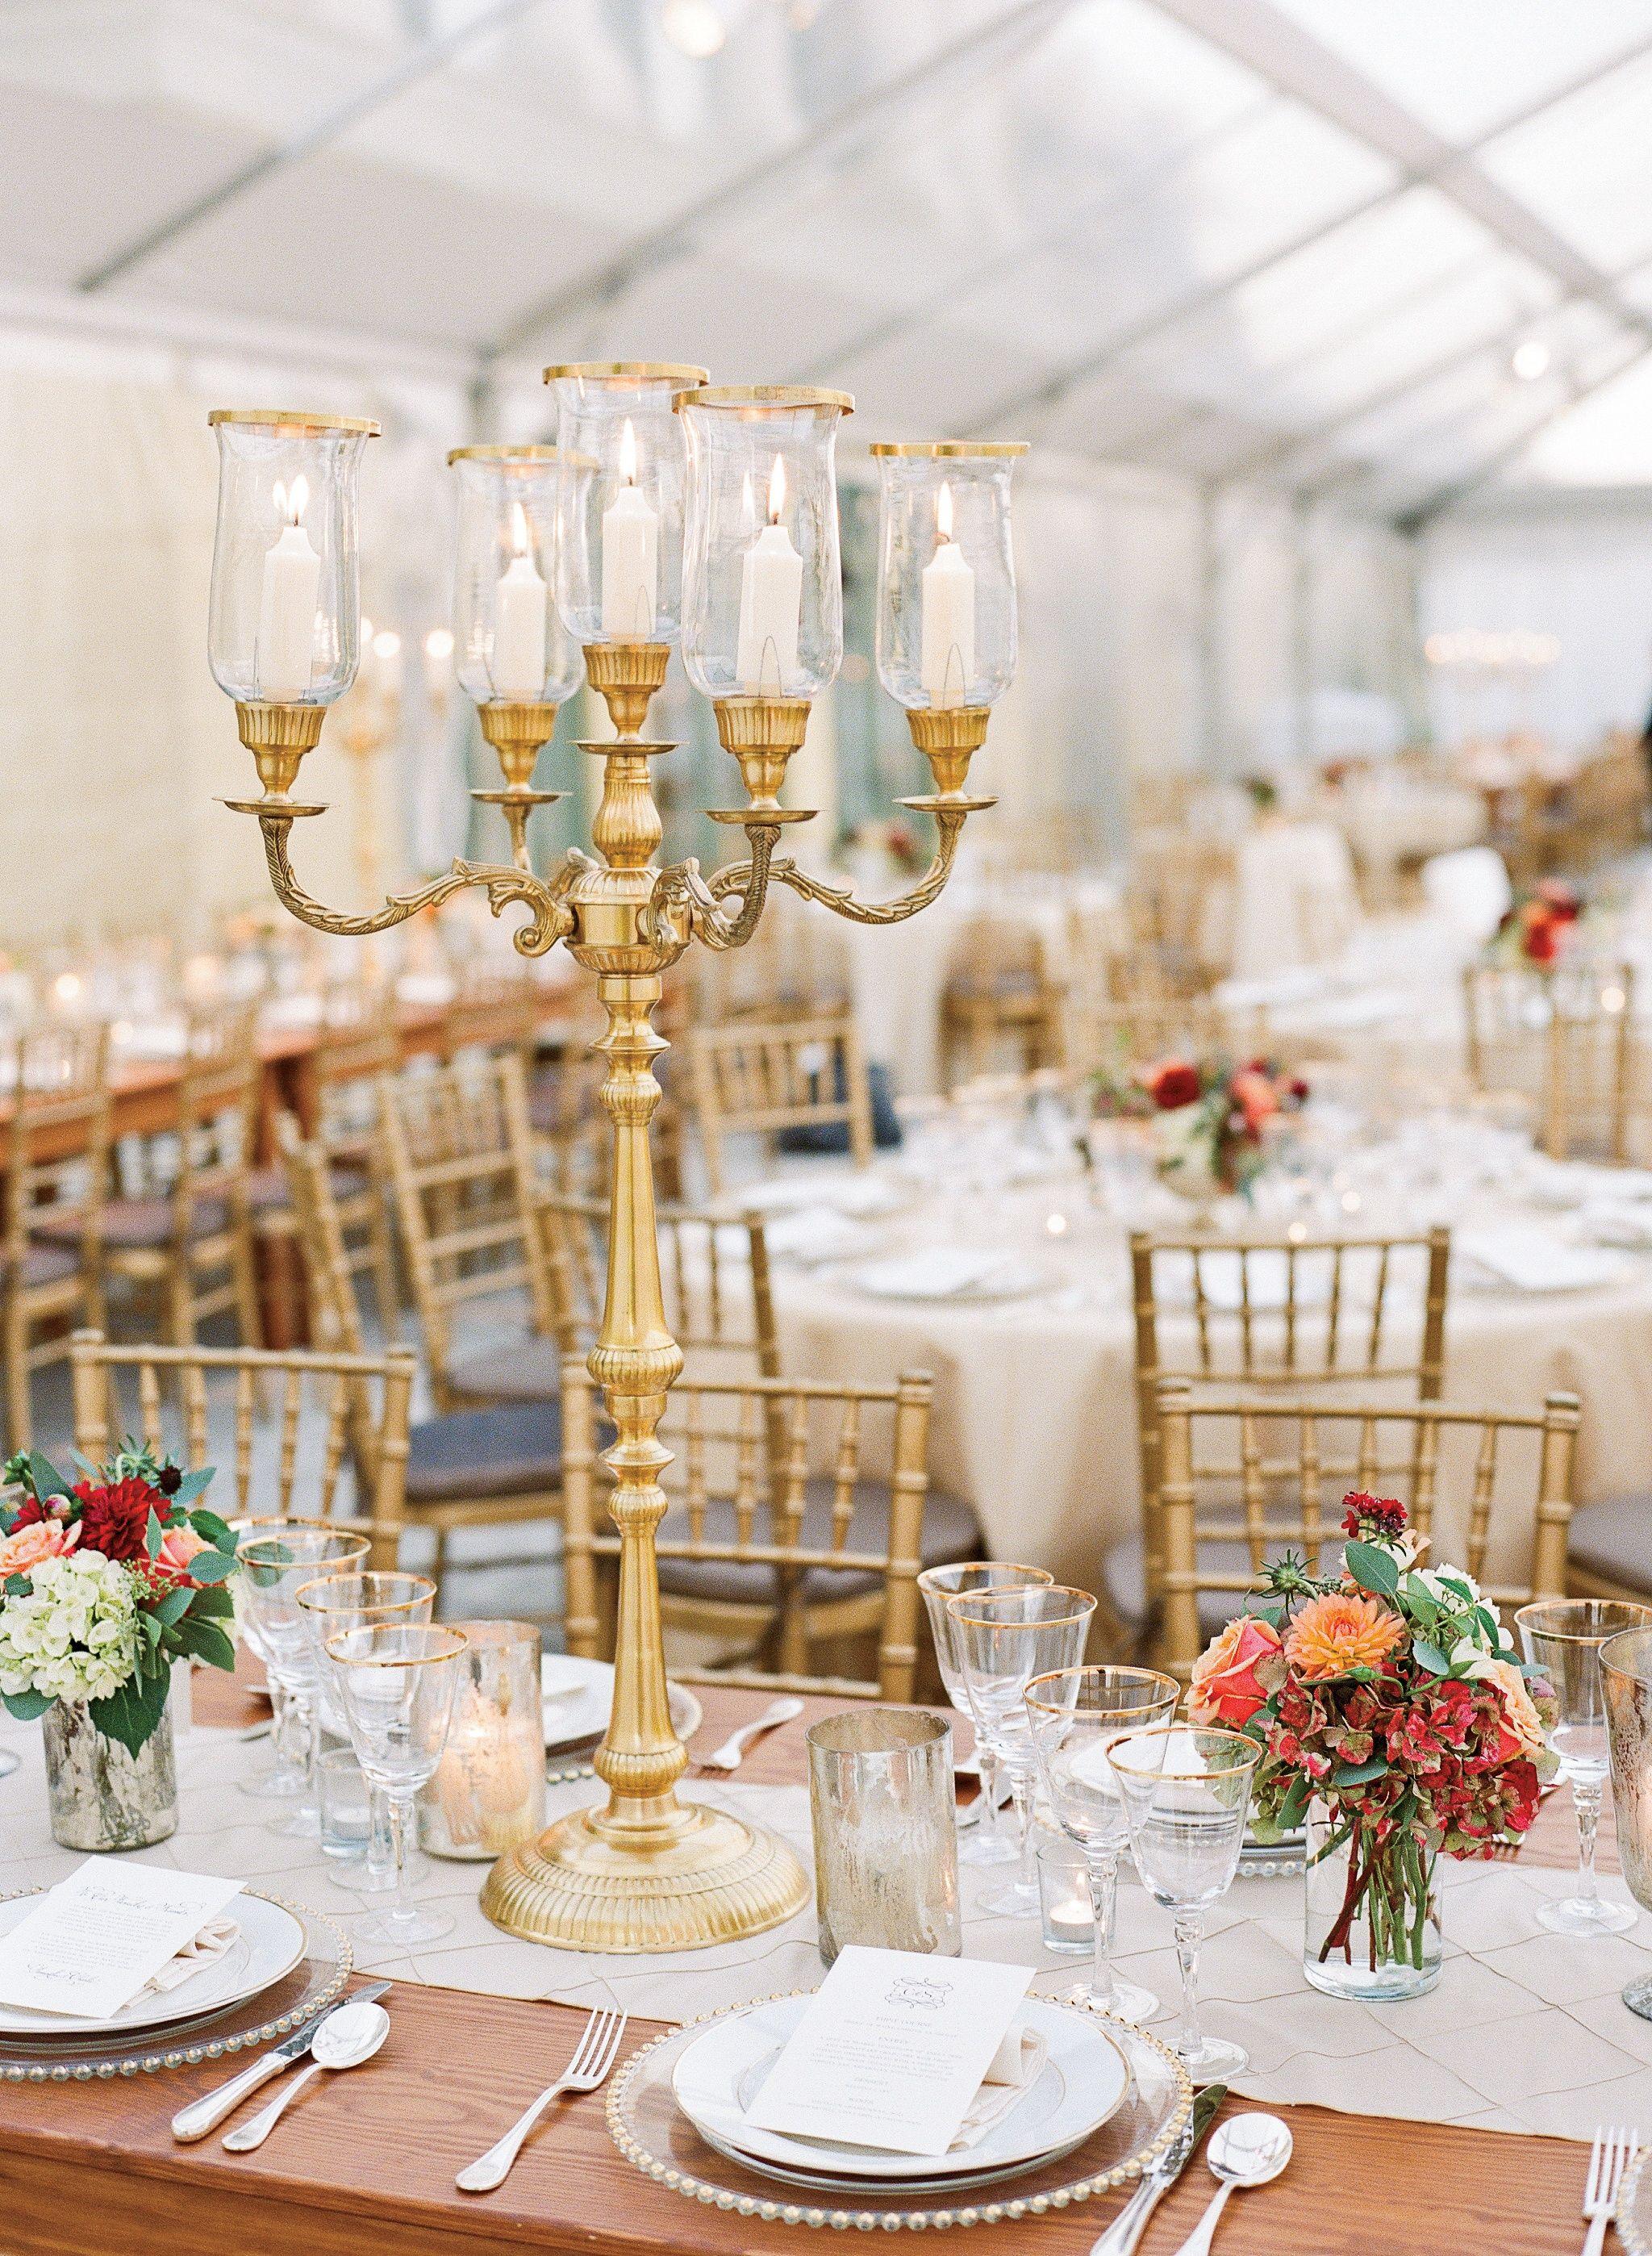 Yacht wedding decorations  Candelabra Centerpieces  Jen Fariello Photography  Theknot